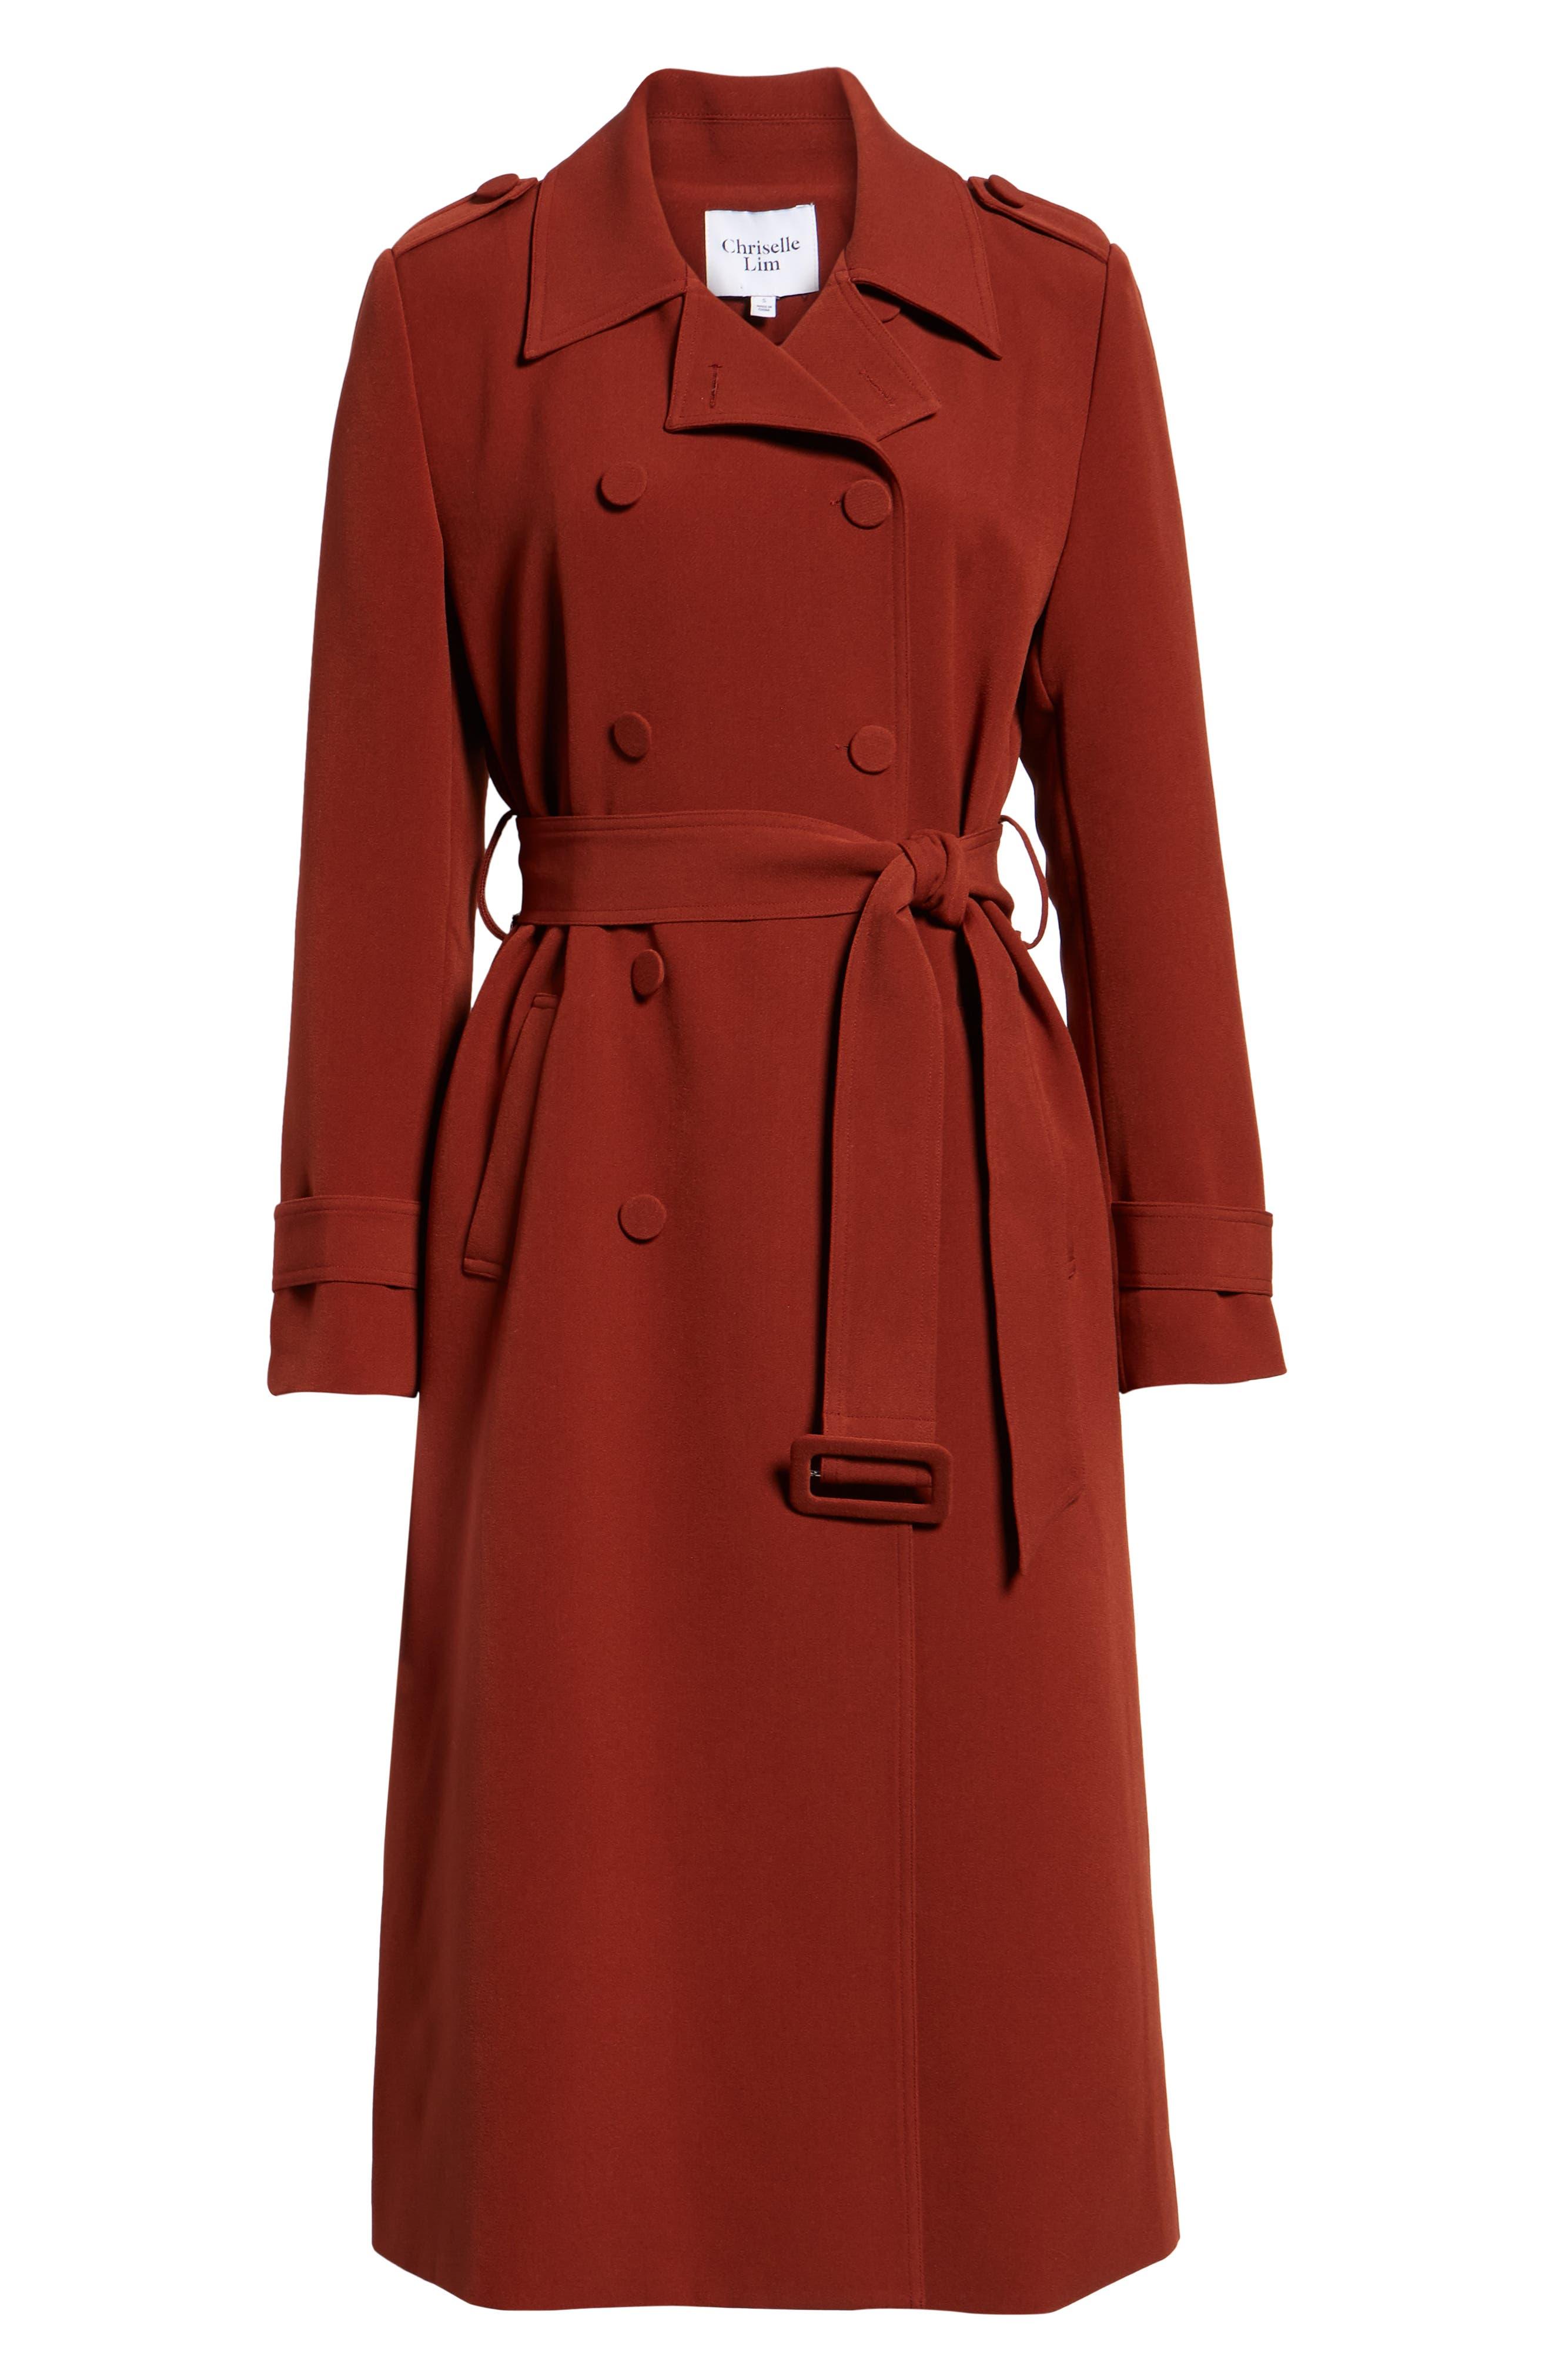 Chriselle Lim Chloe Trench Coat, Alternate, color, RUST